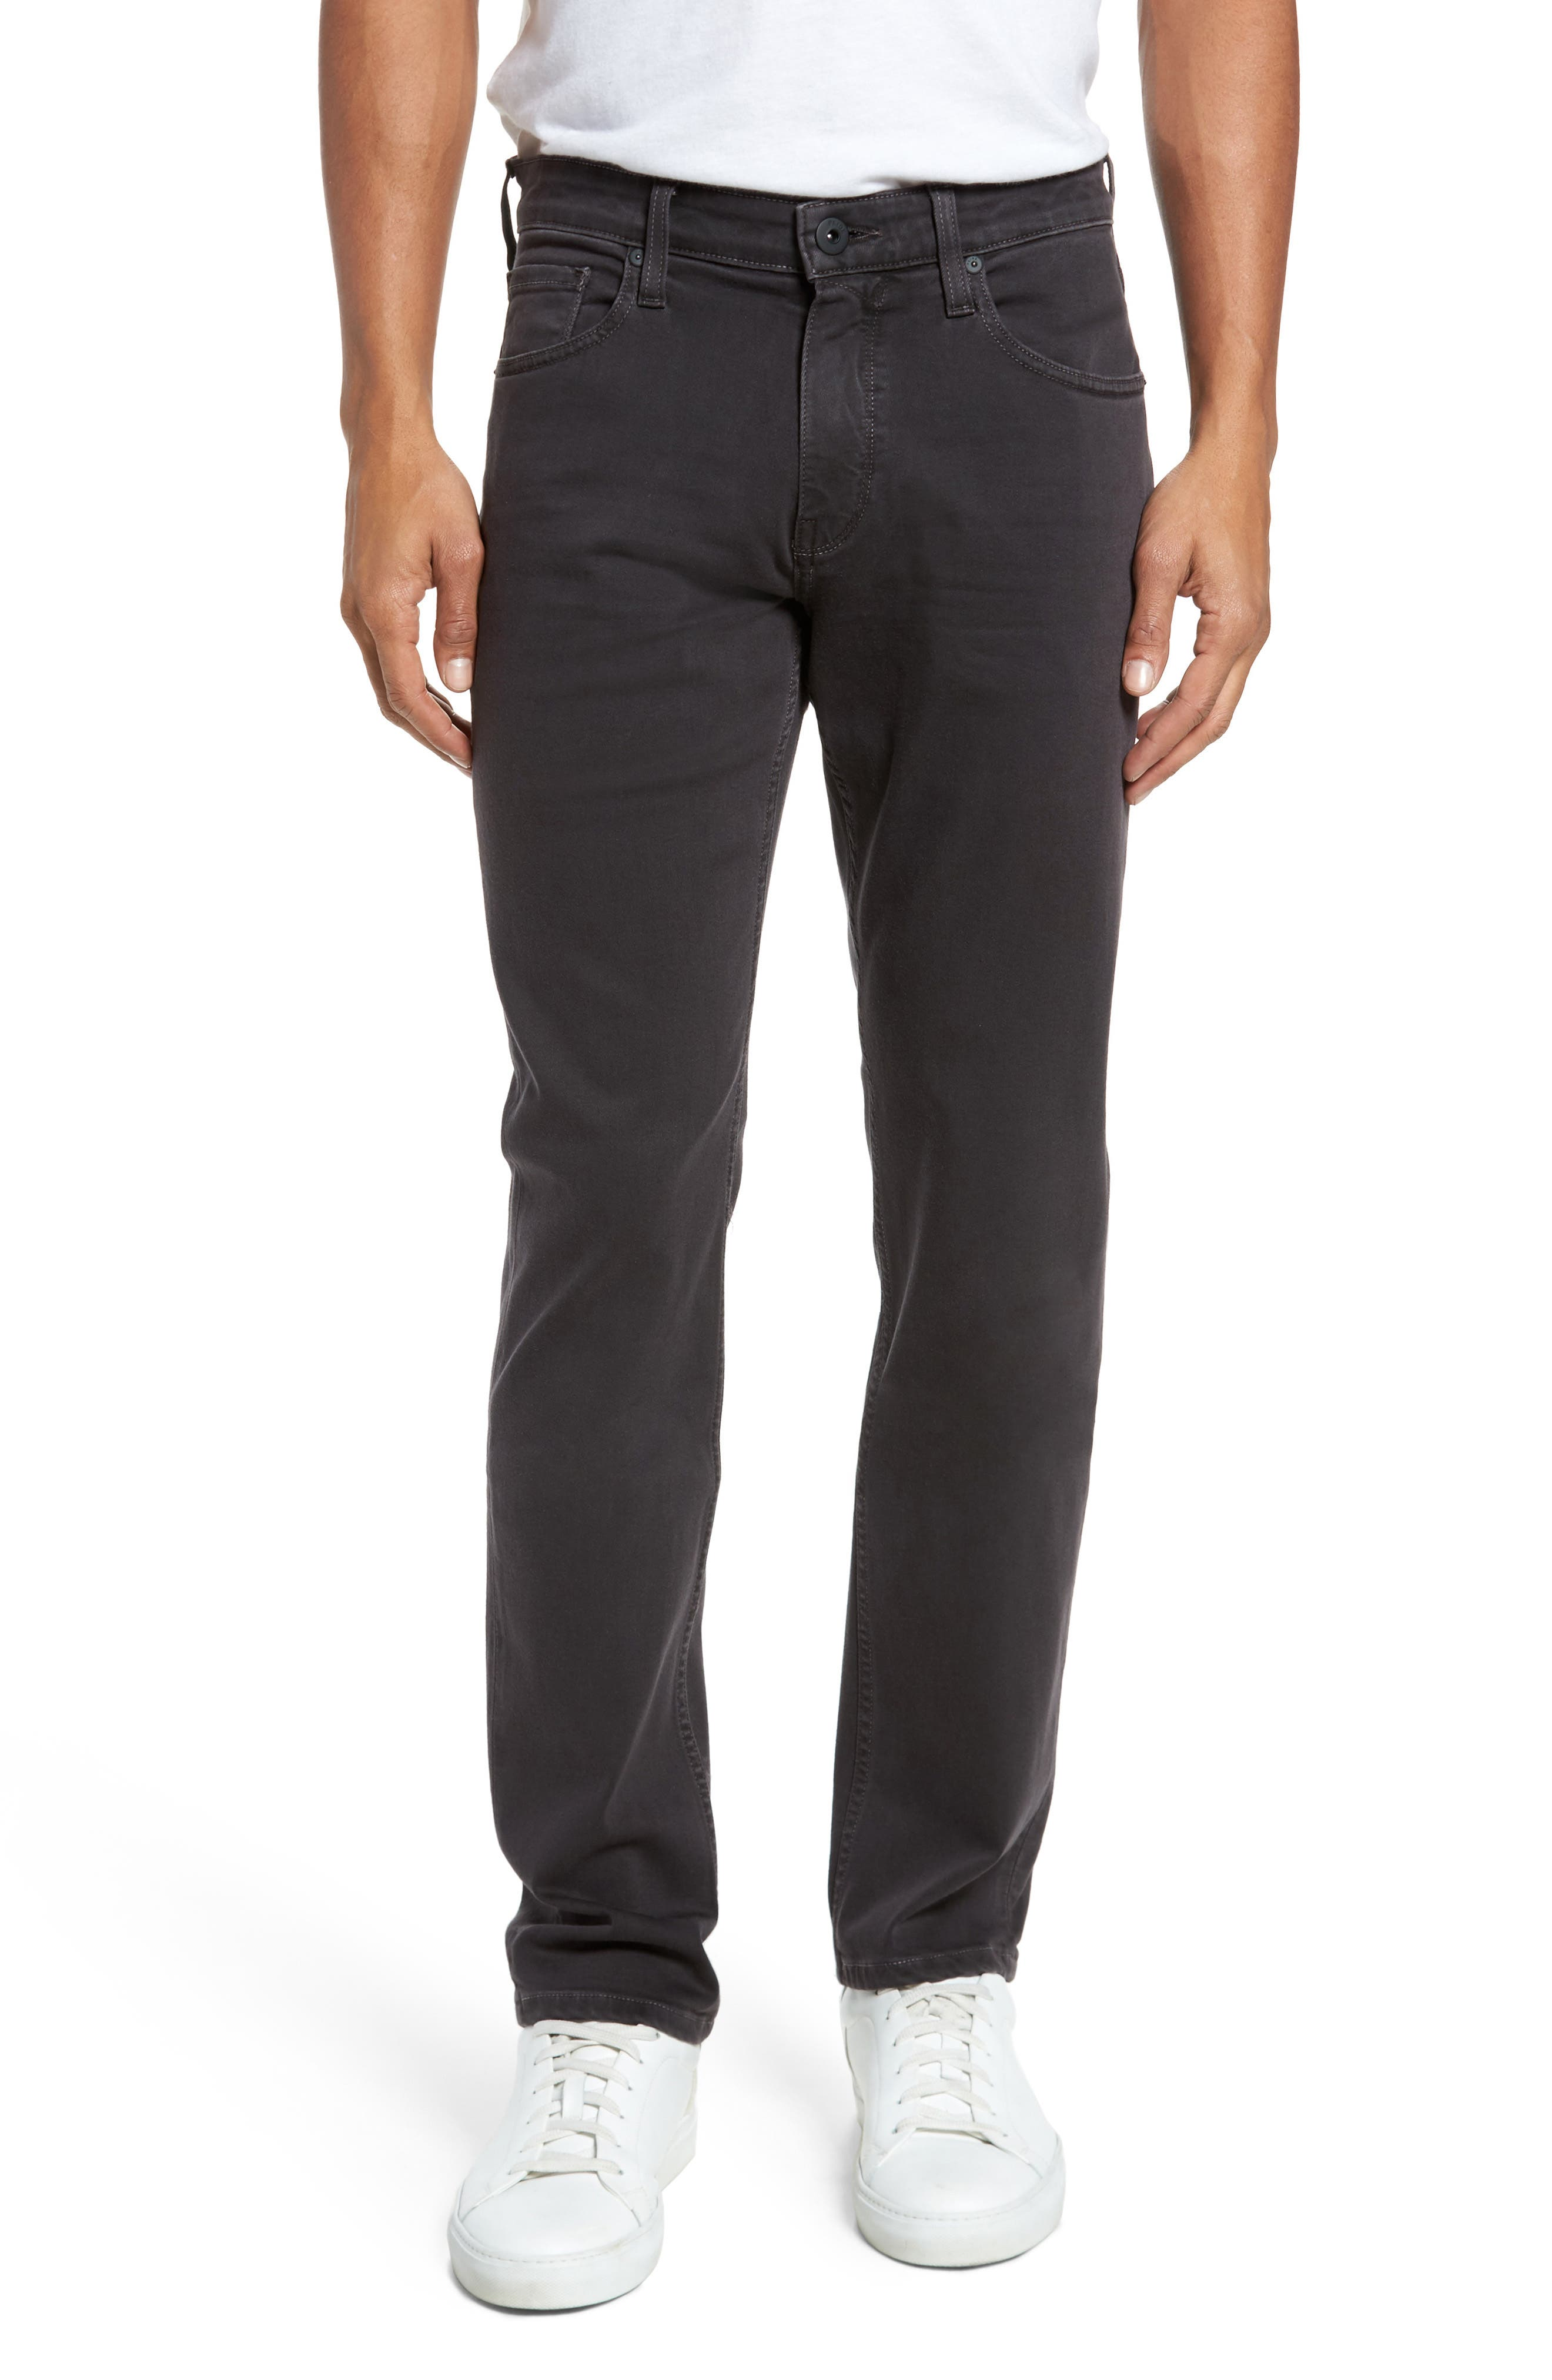 Transcend - Federal Slim Straight Leg Jeans,                             Main thumbnail 1, color,                             001